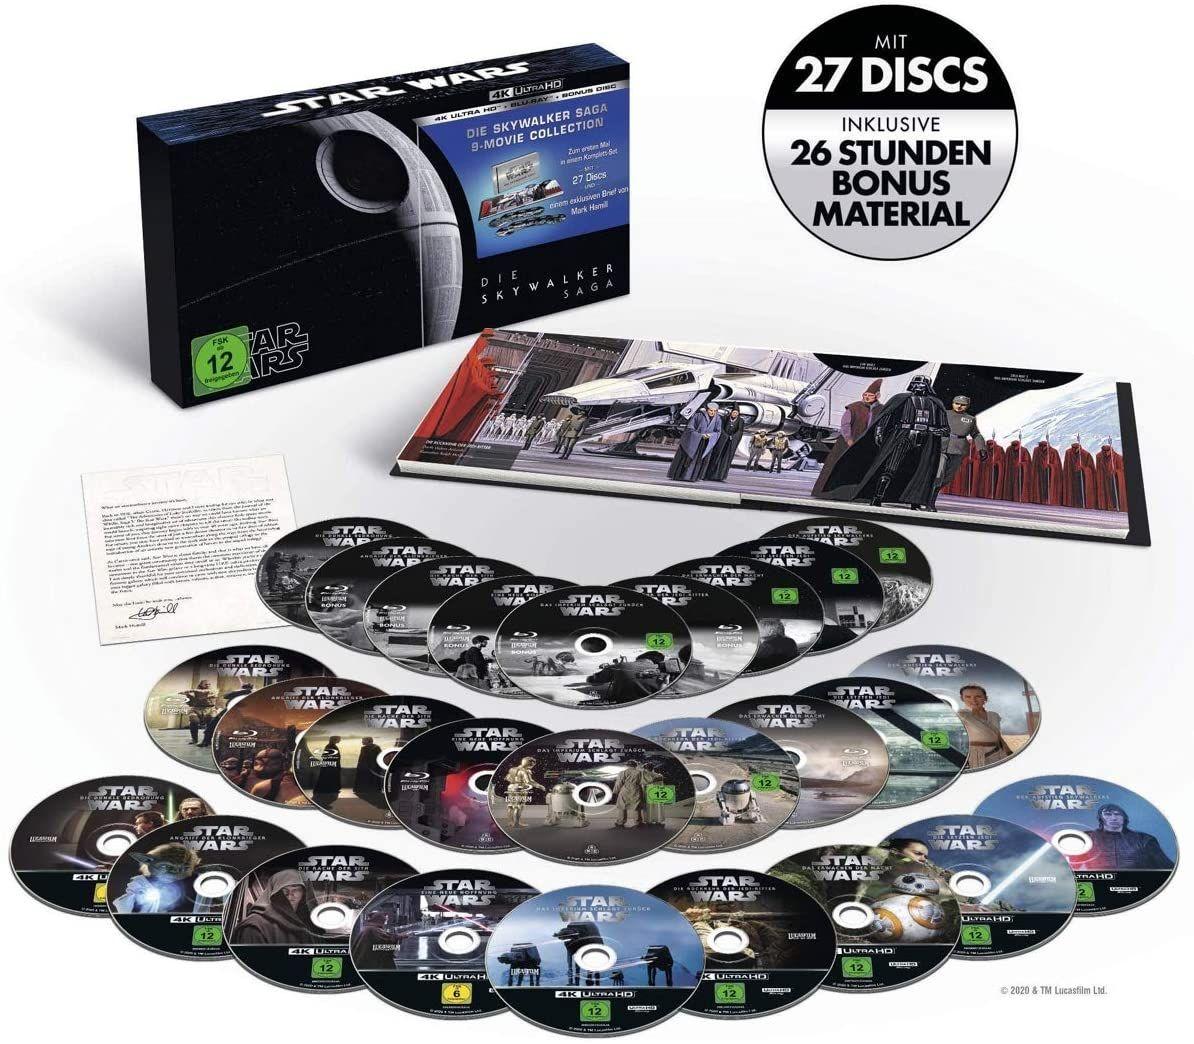 Star Wars 1 - 9 - Die Skywalker Saga 4K Ultra HD [Blu-ray] [Amazon]